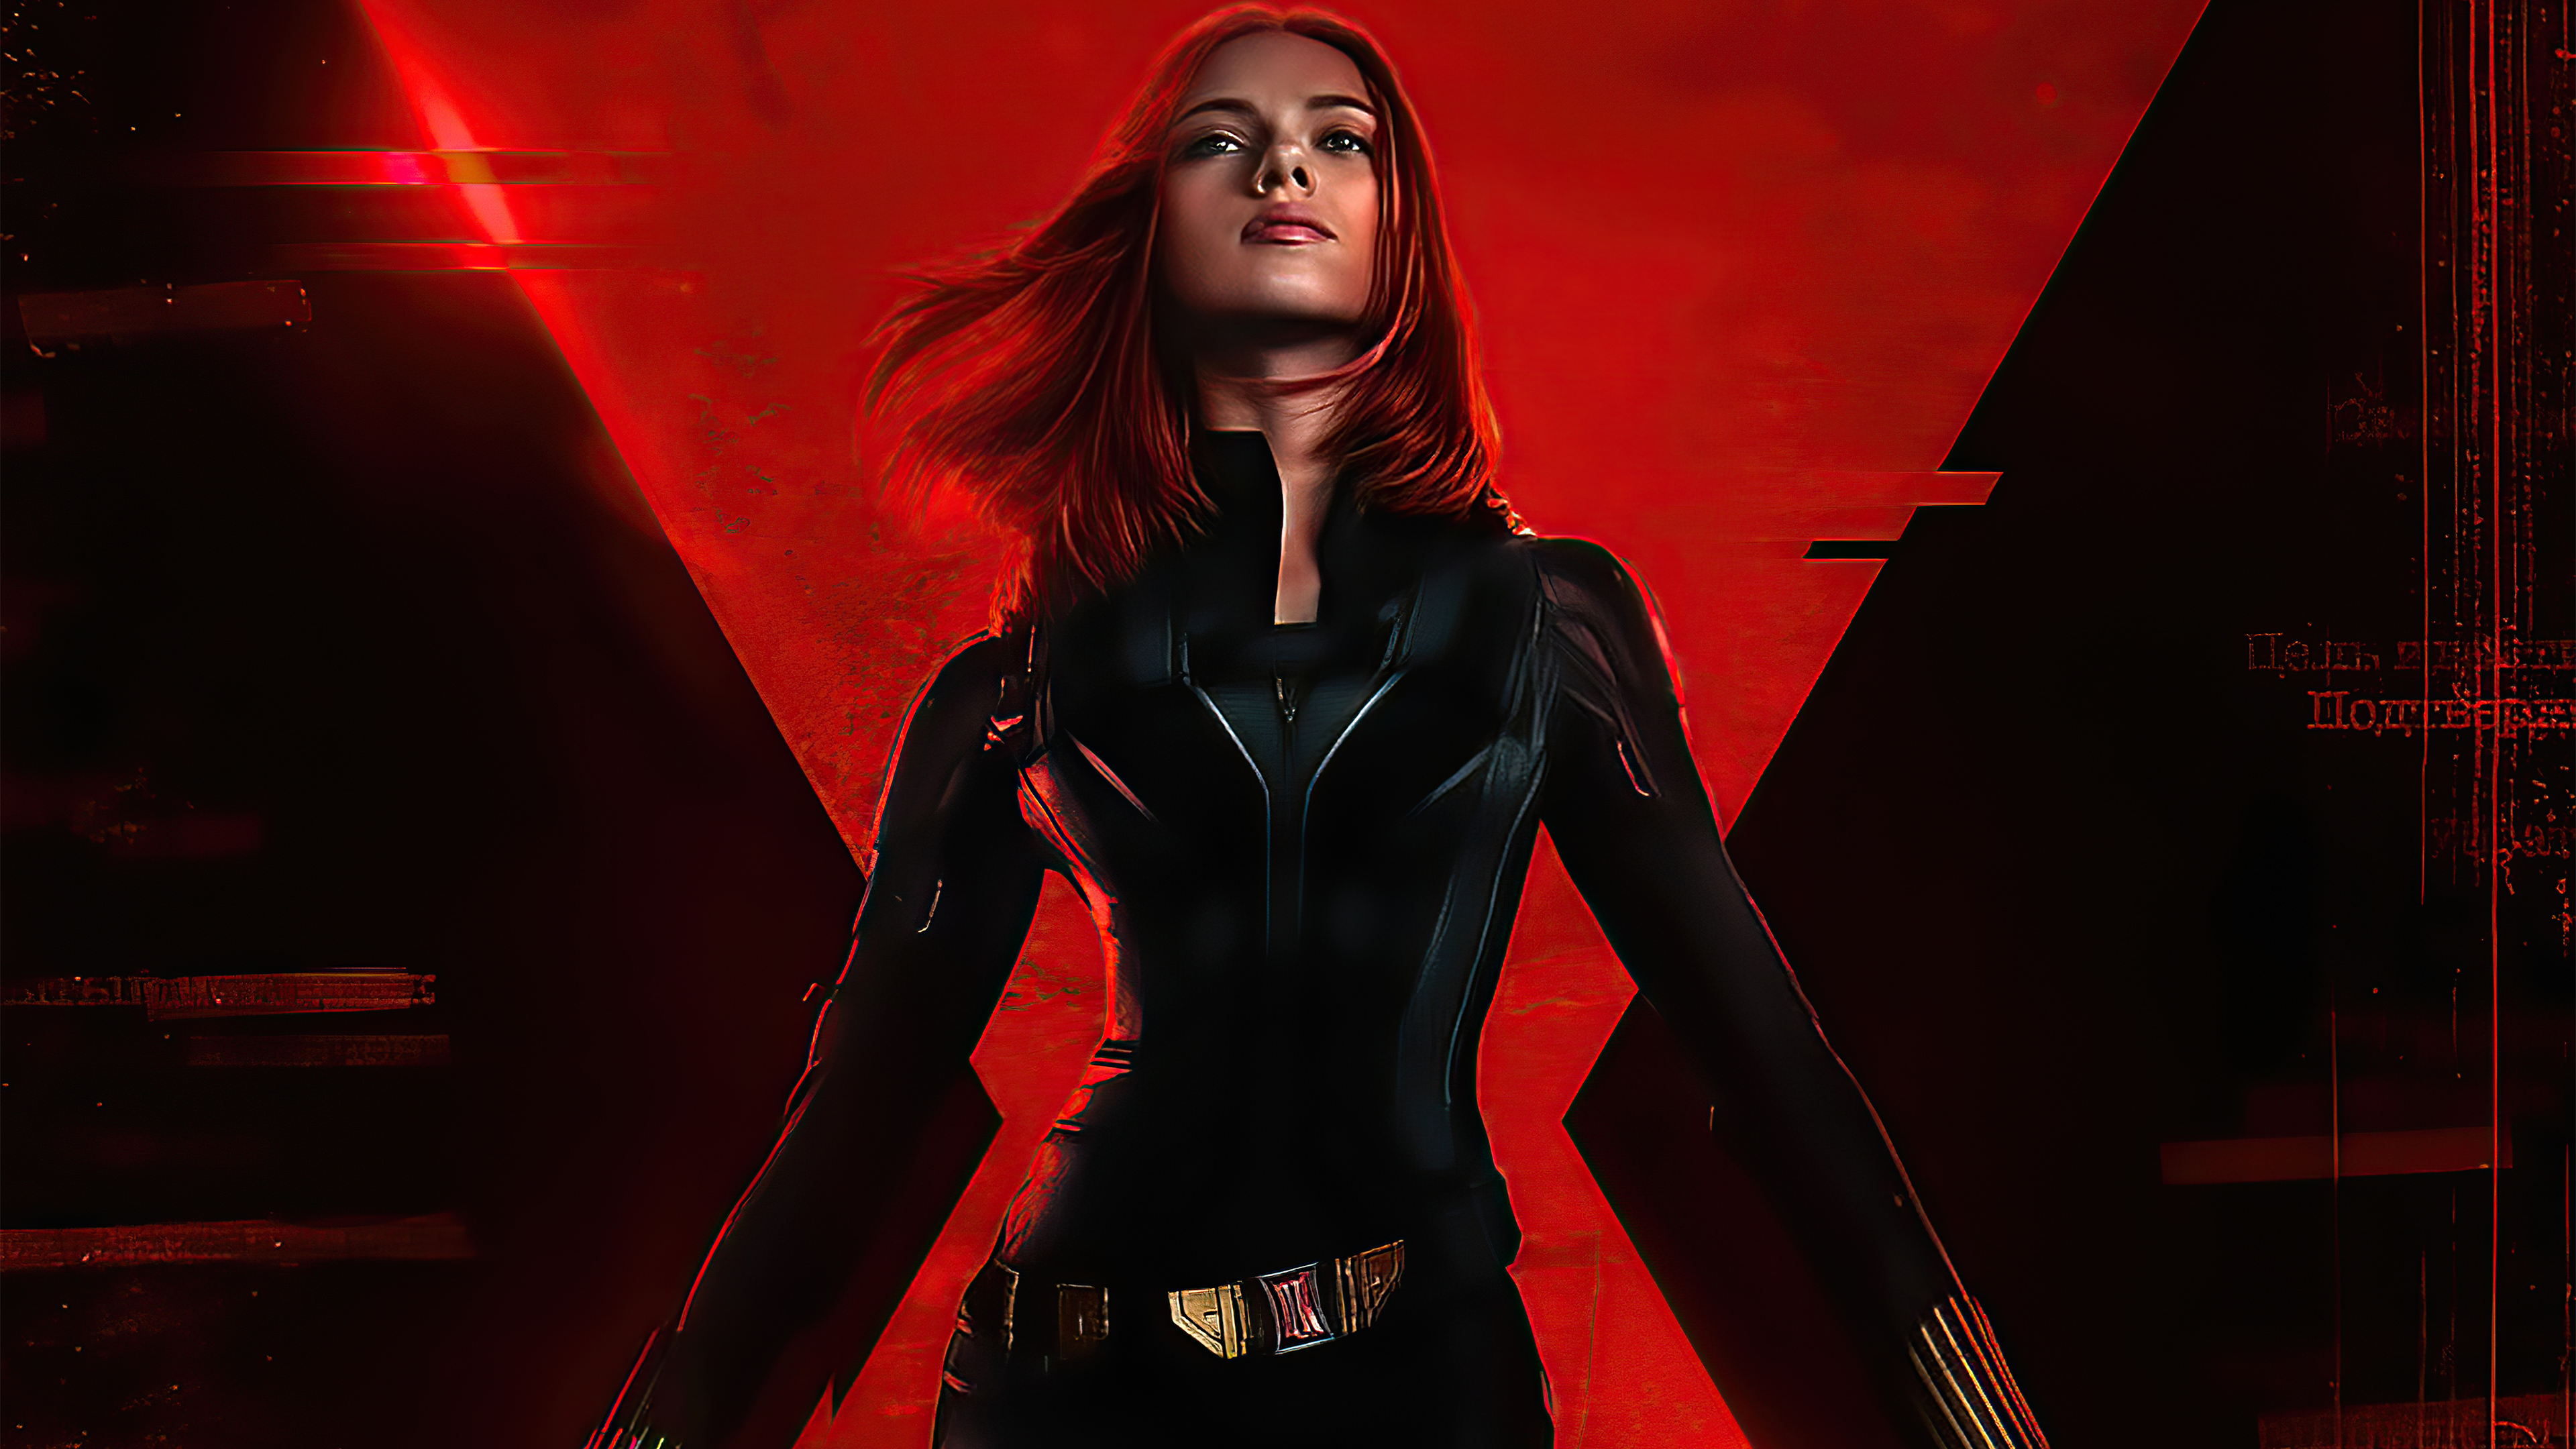 Wallpaper Black Widow Movie